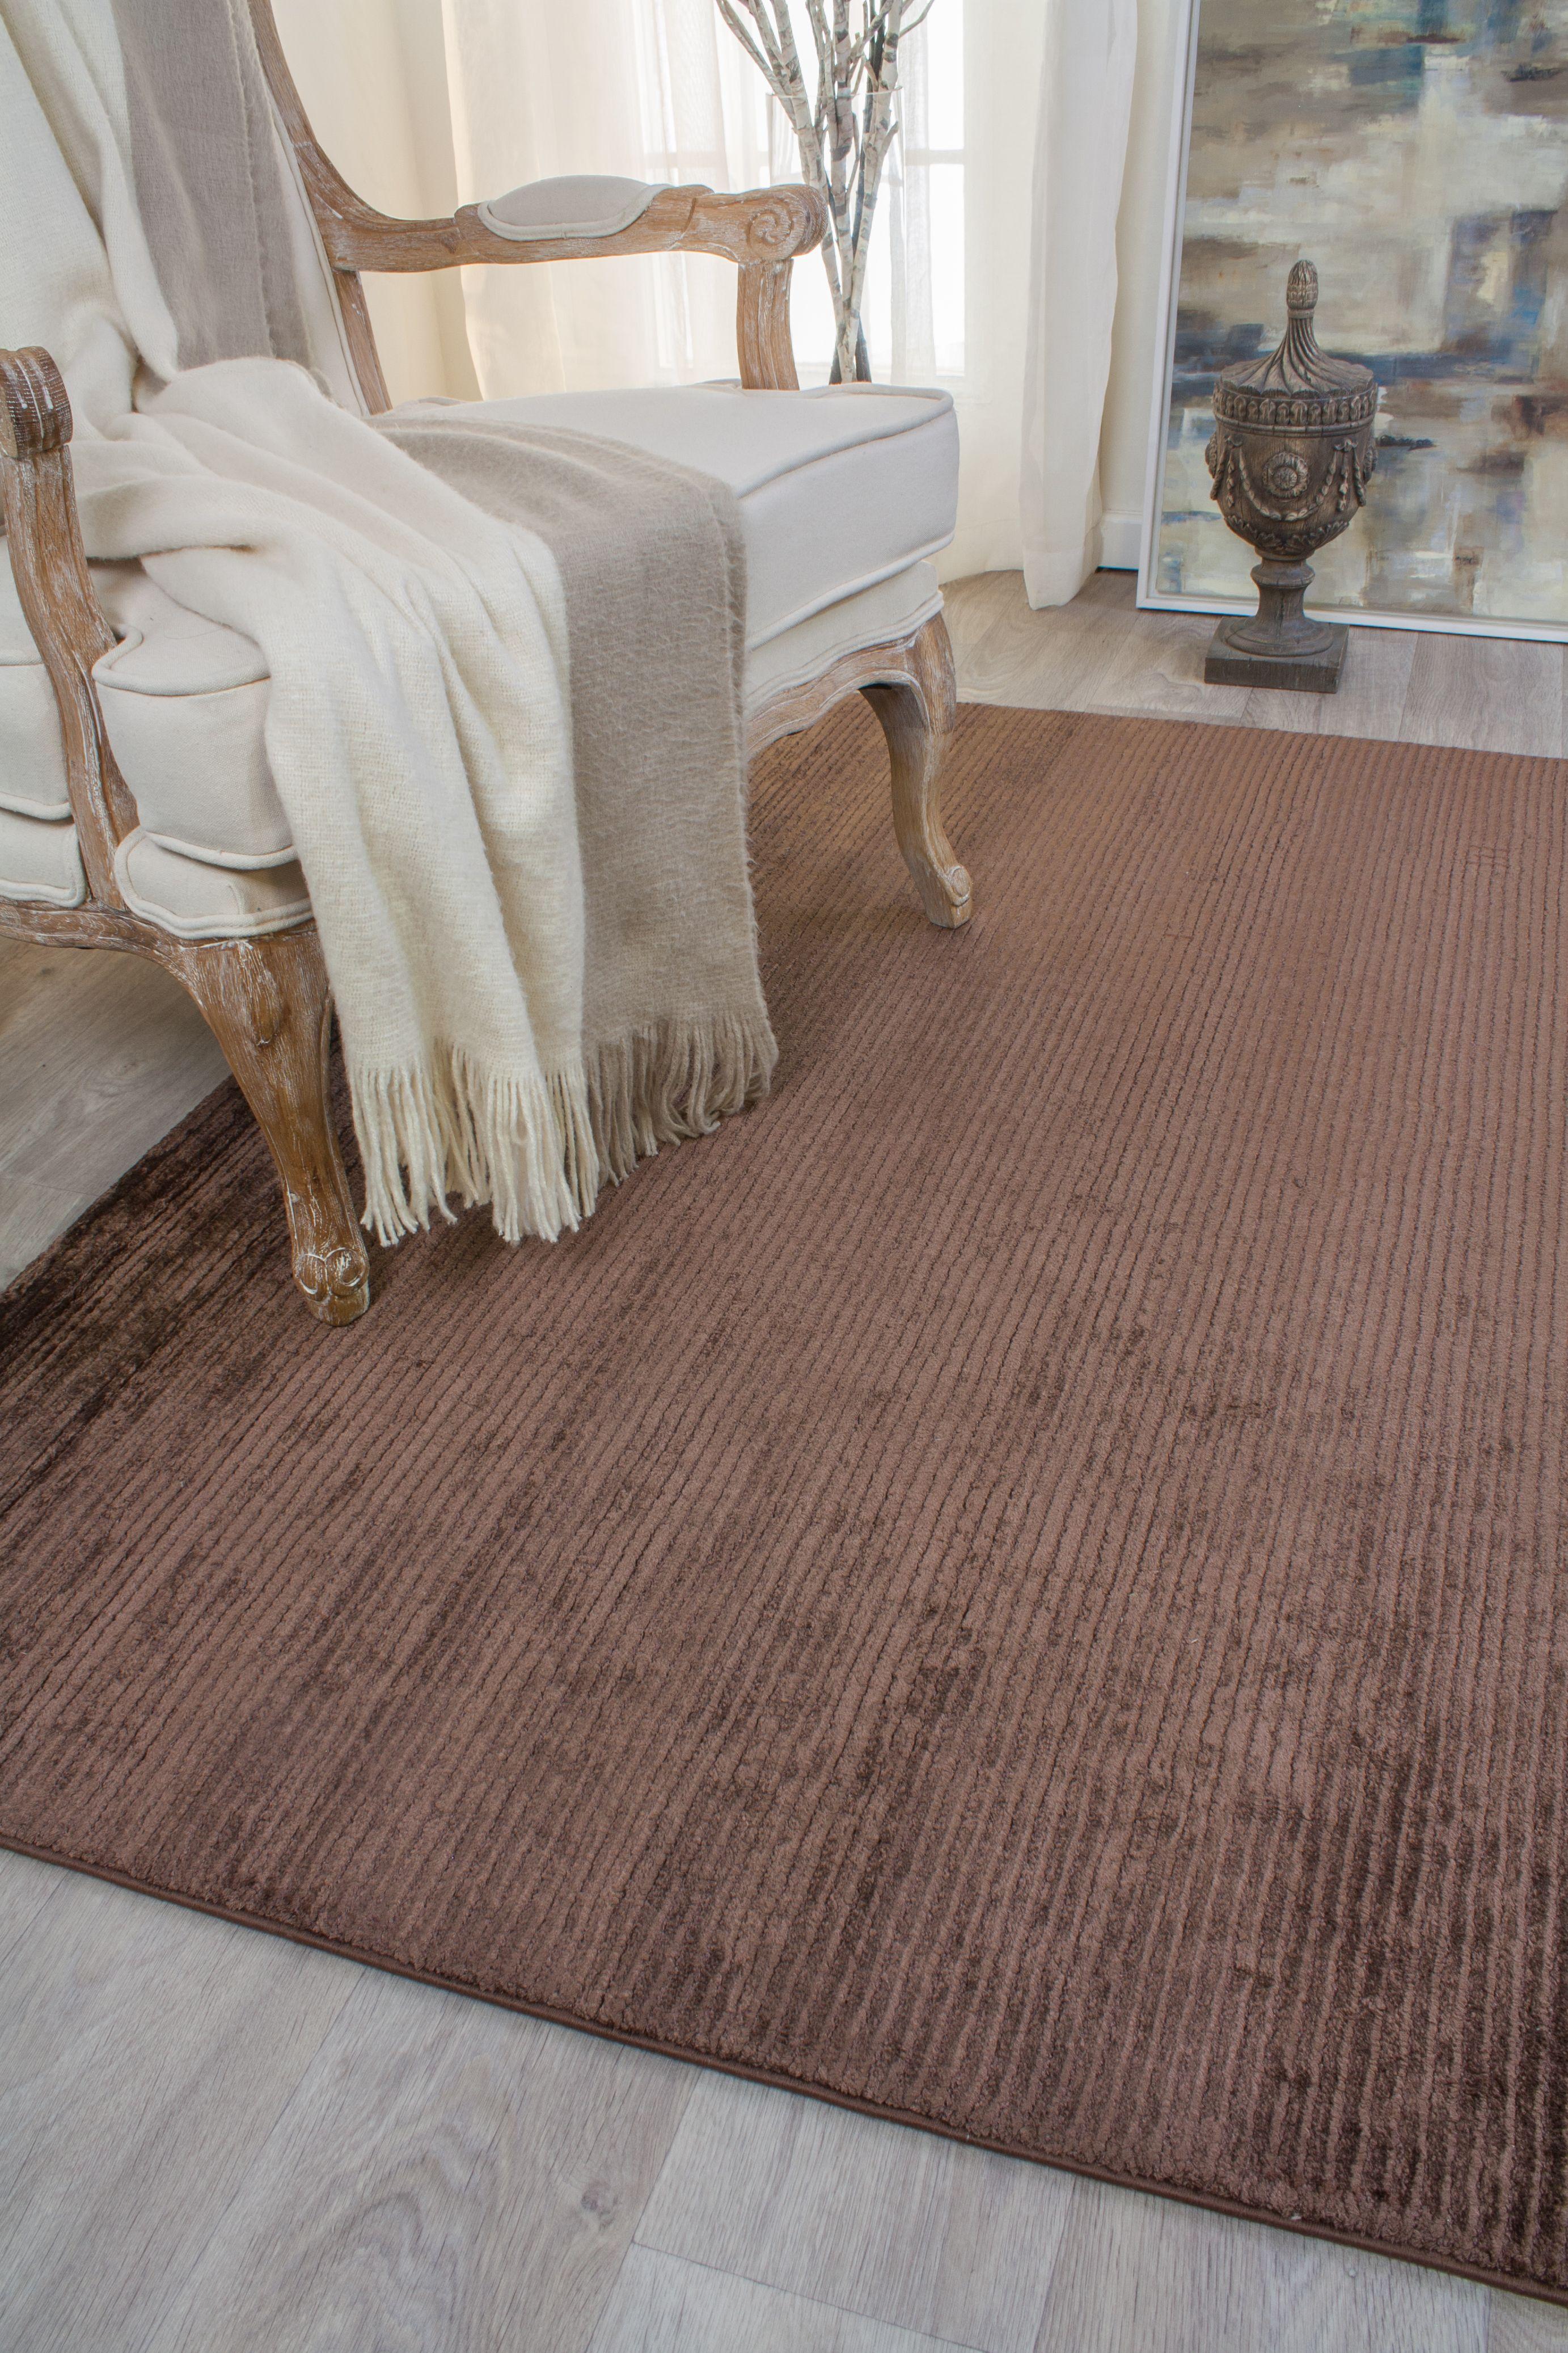 Best Adel Dbrown White Carpet Brown Carpet Beige Carpet 400 x 300